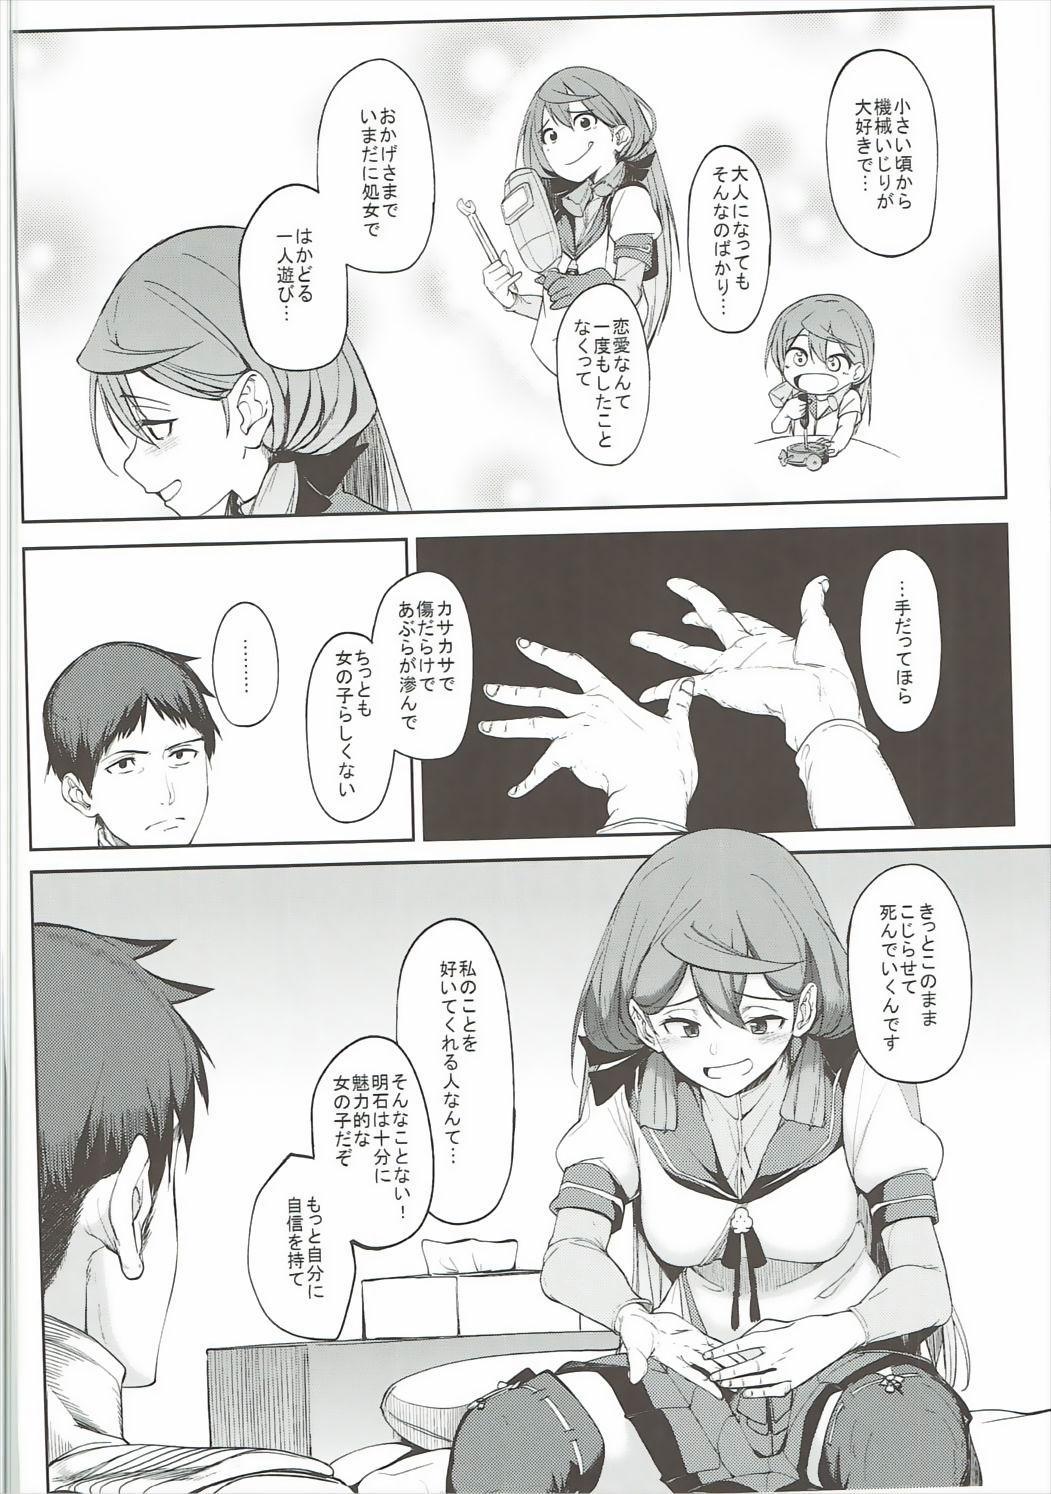 Akashi Vibration 2 6